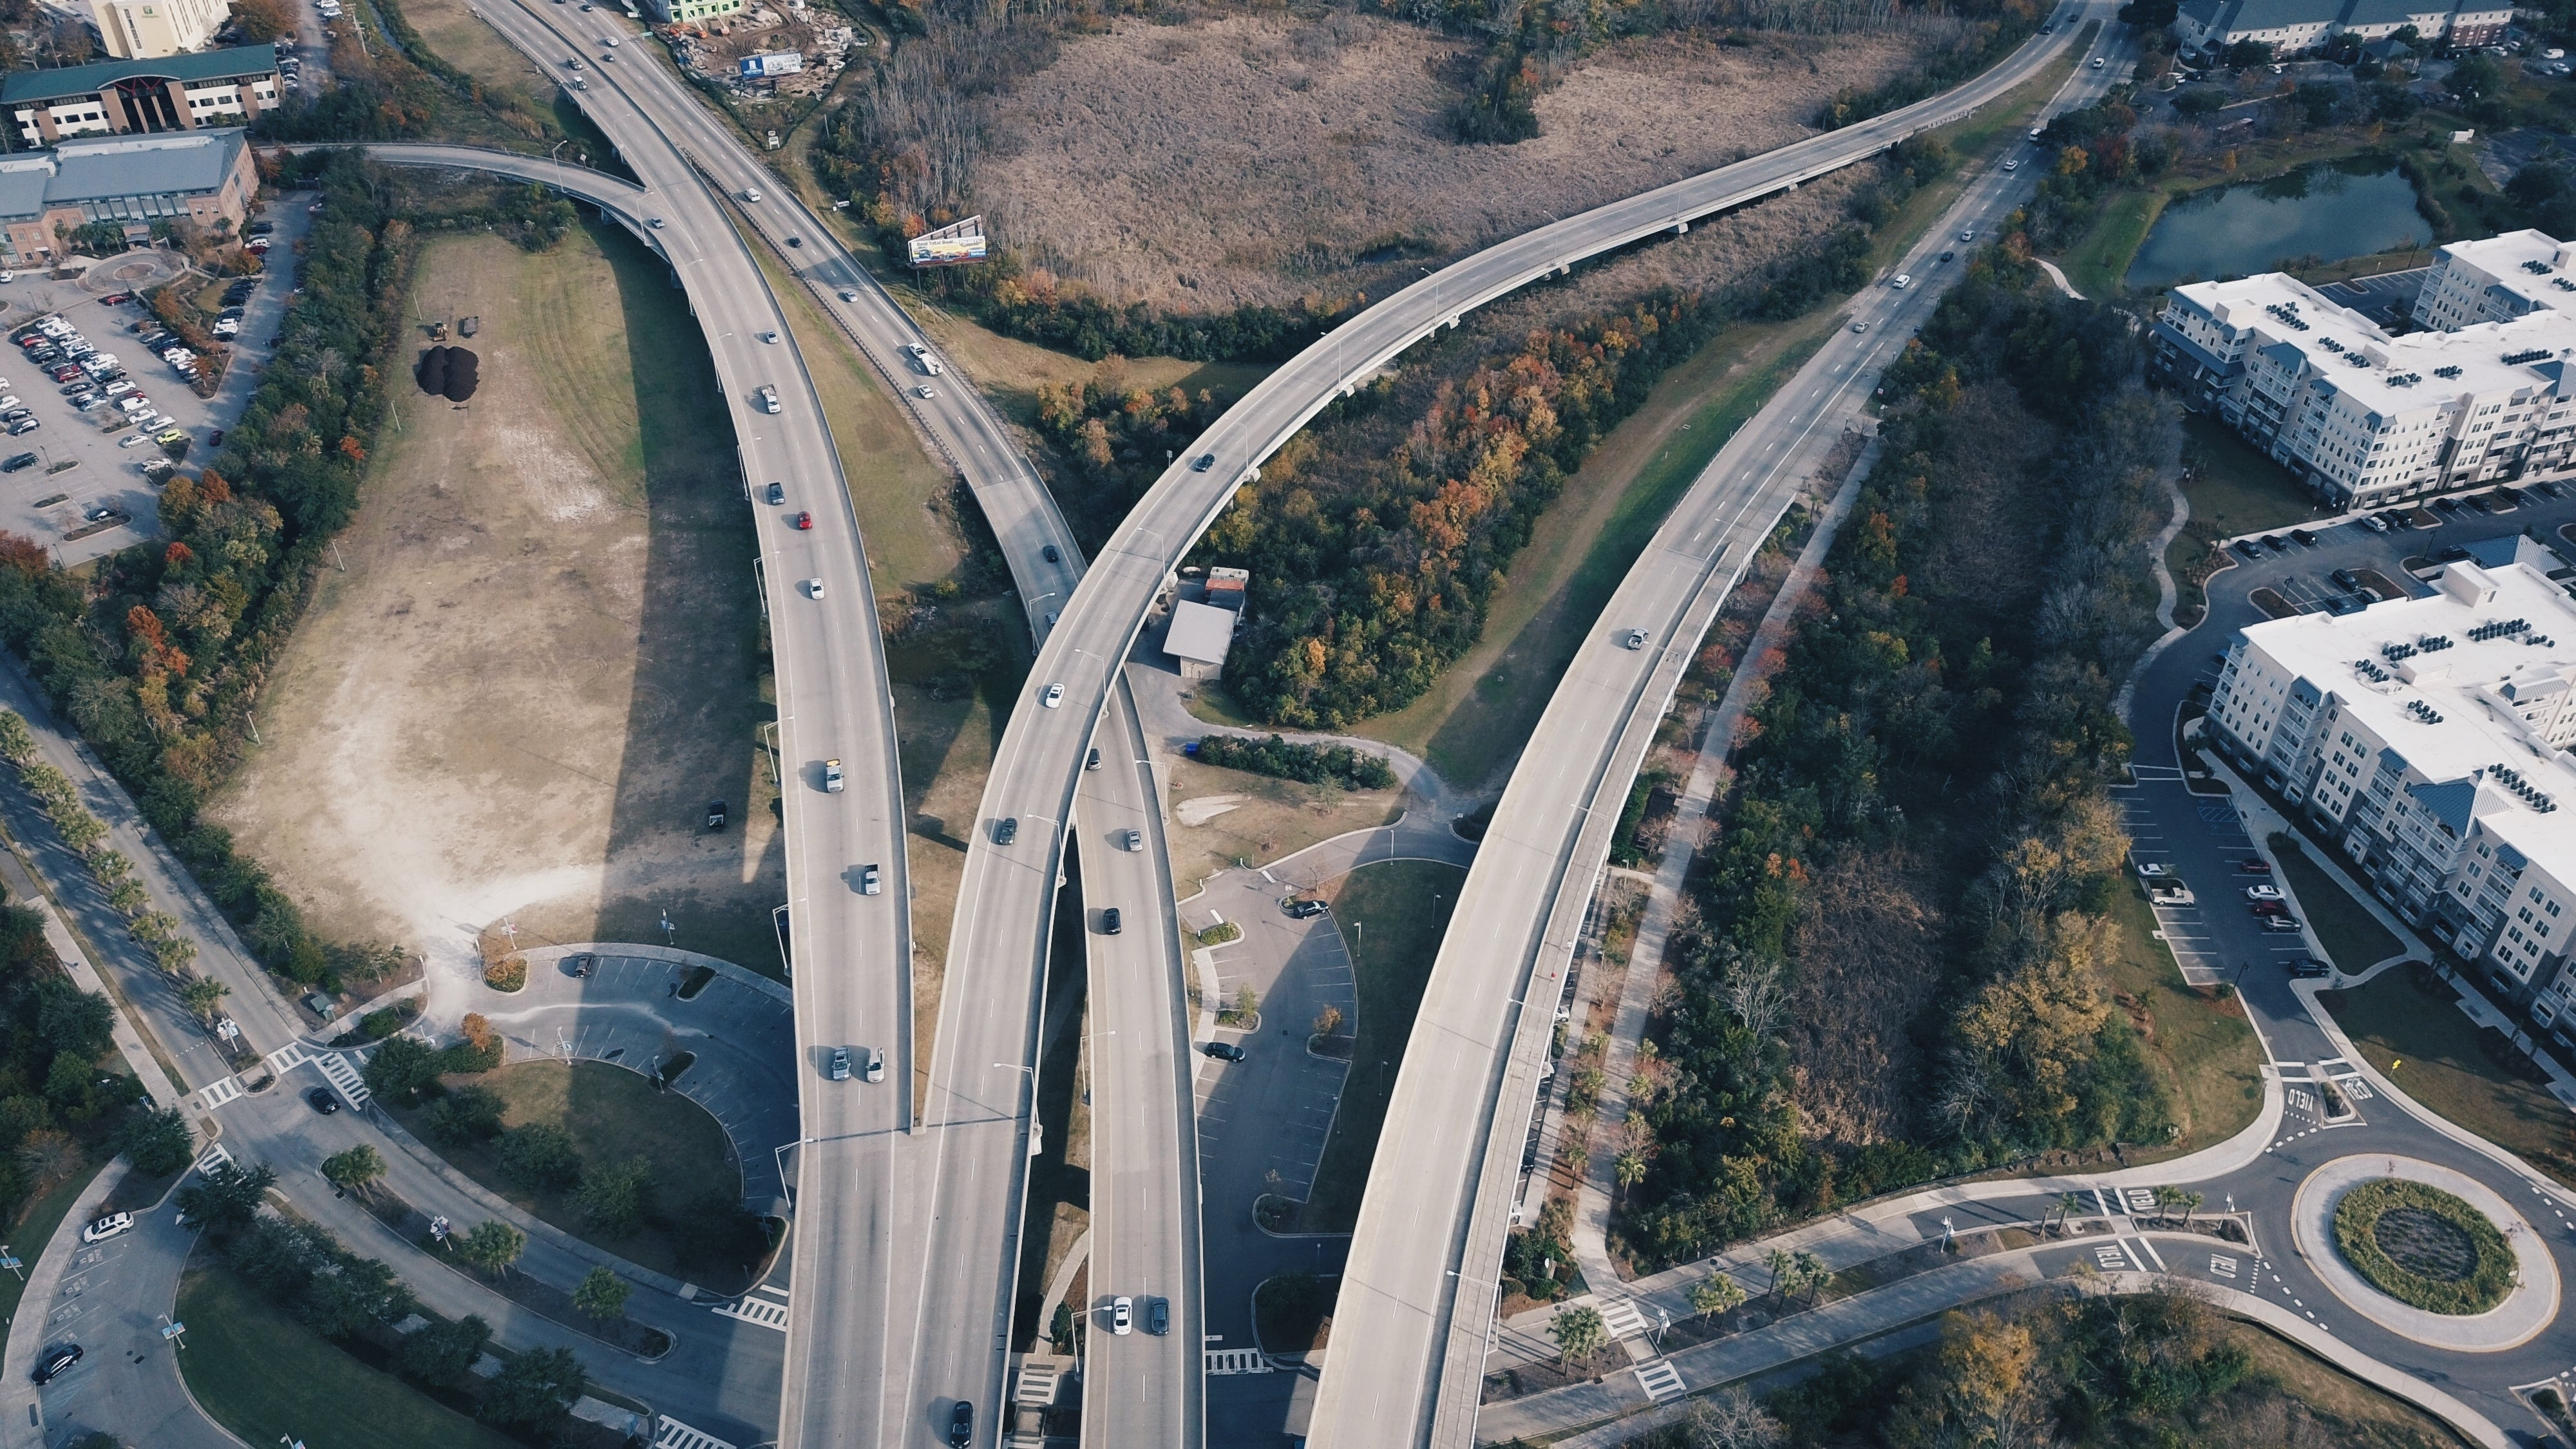 Carretera estadounidense